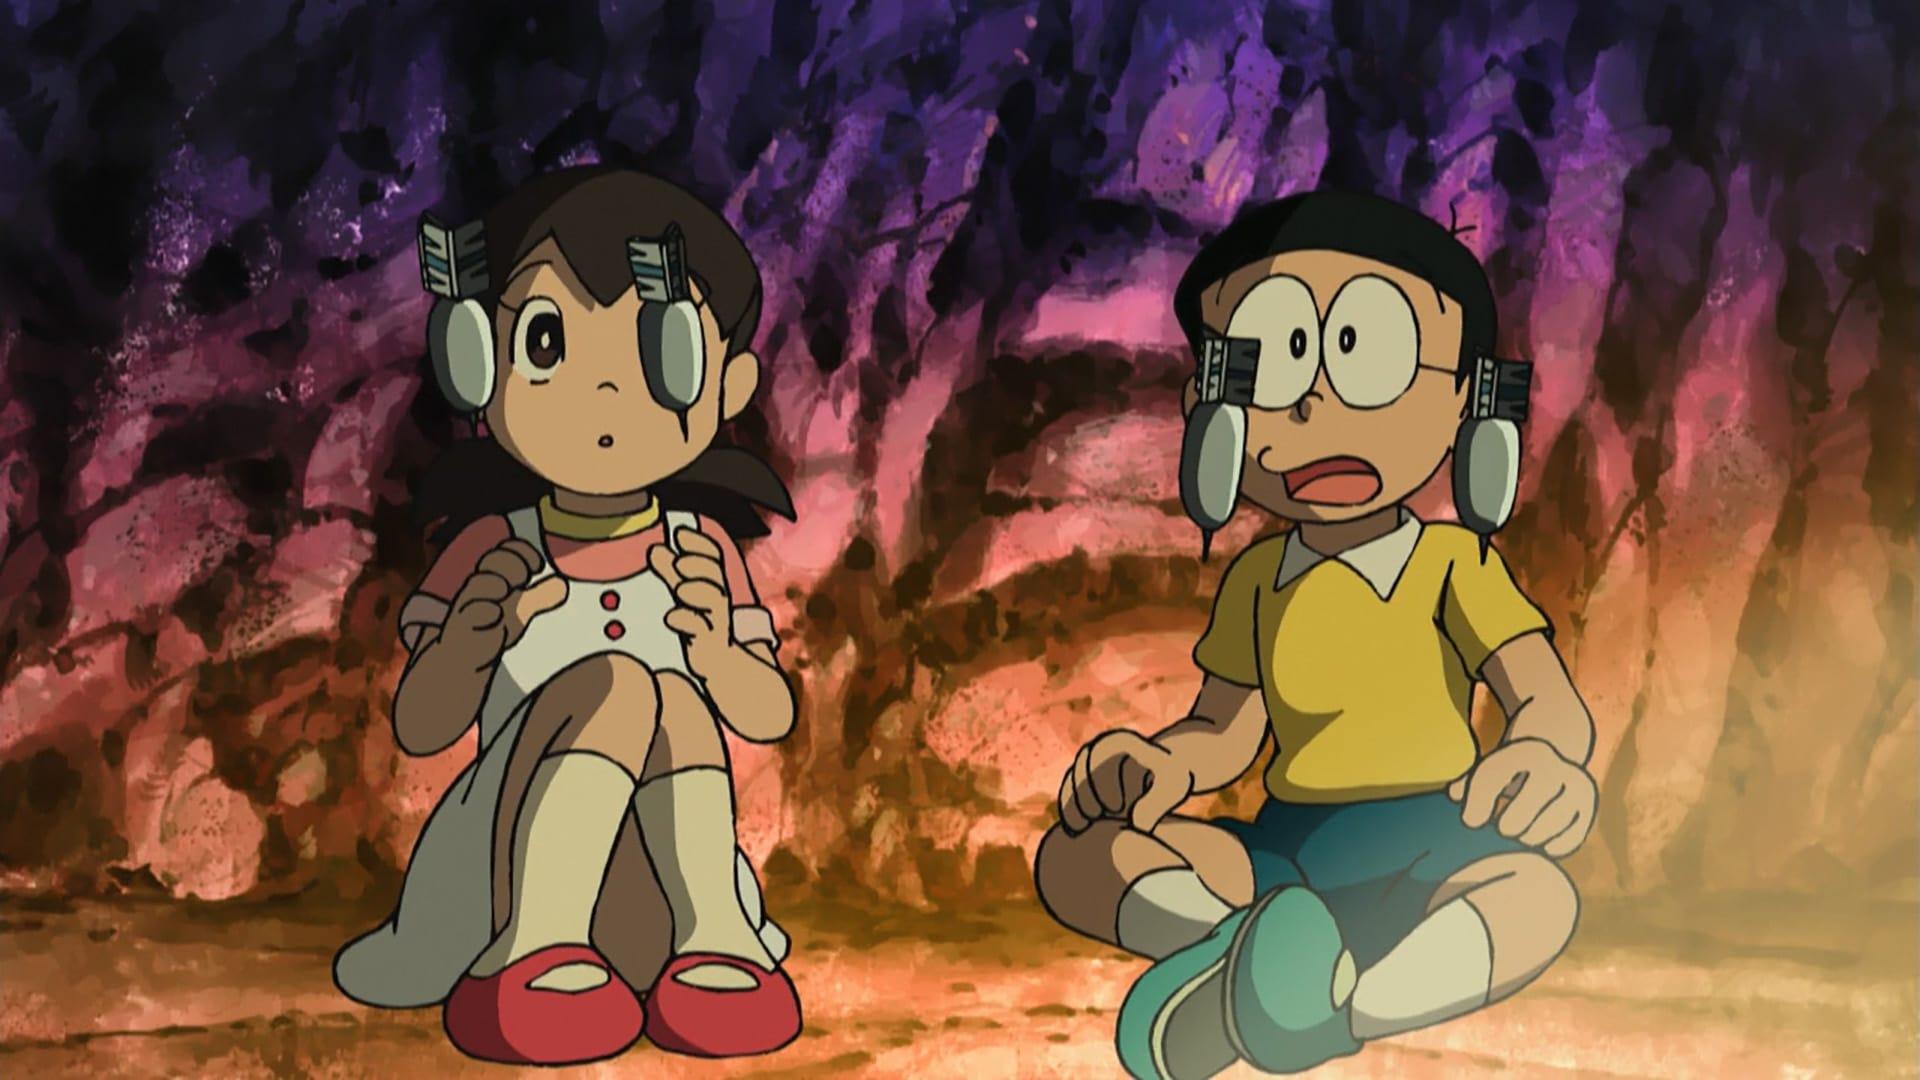 Doraemon the Movie: Nobita's New Great Adventure Into the Underworld - The Seven Magic Users Movie